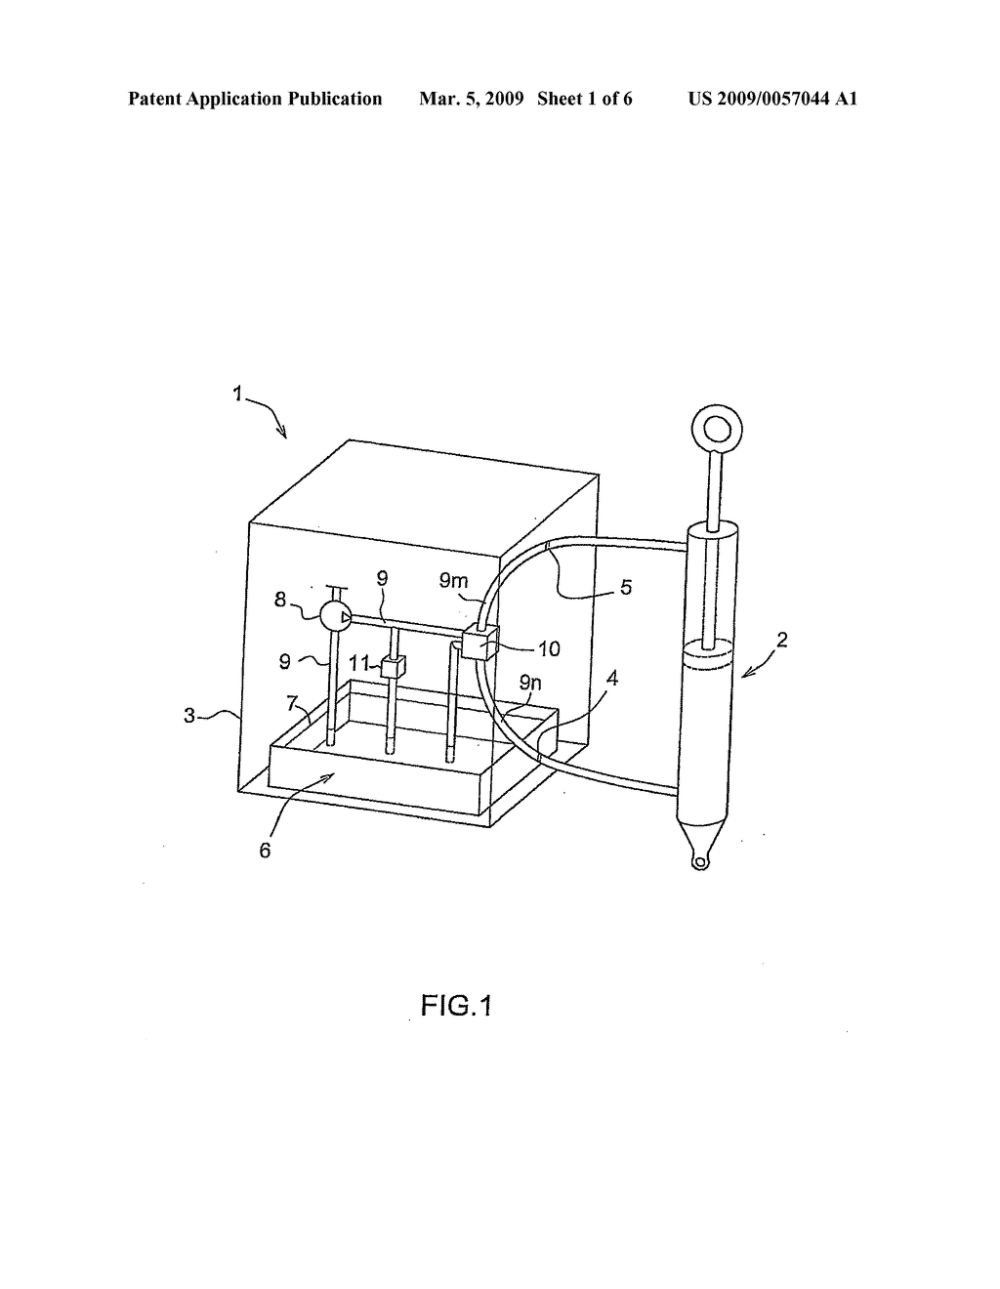 medium resolution of hydraulic pump unit for a hydraulic cab tilting mechanism diagram schematic and image 02